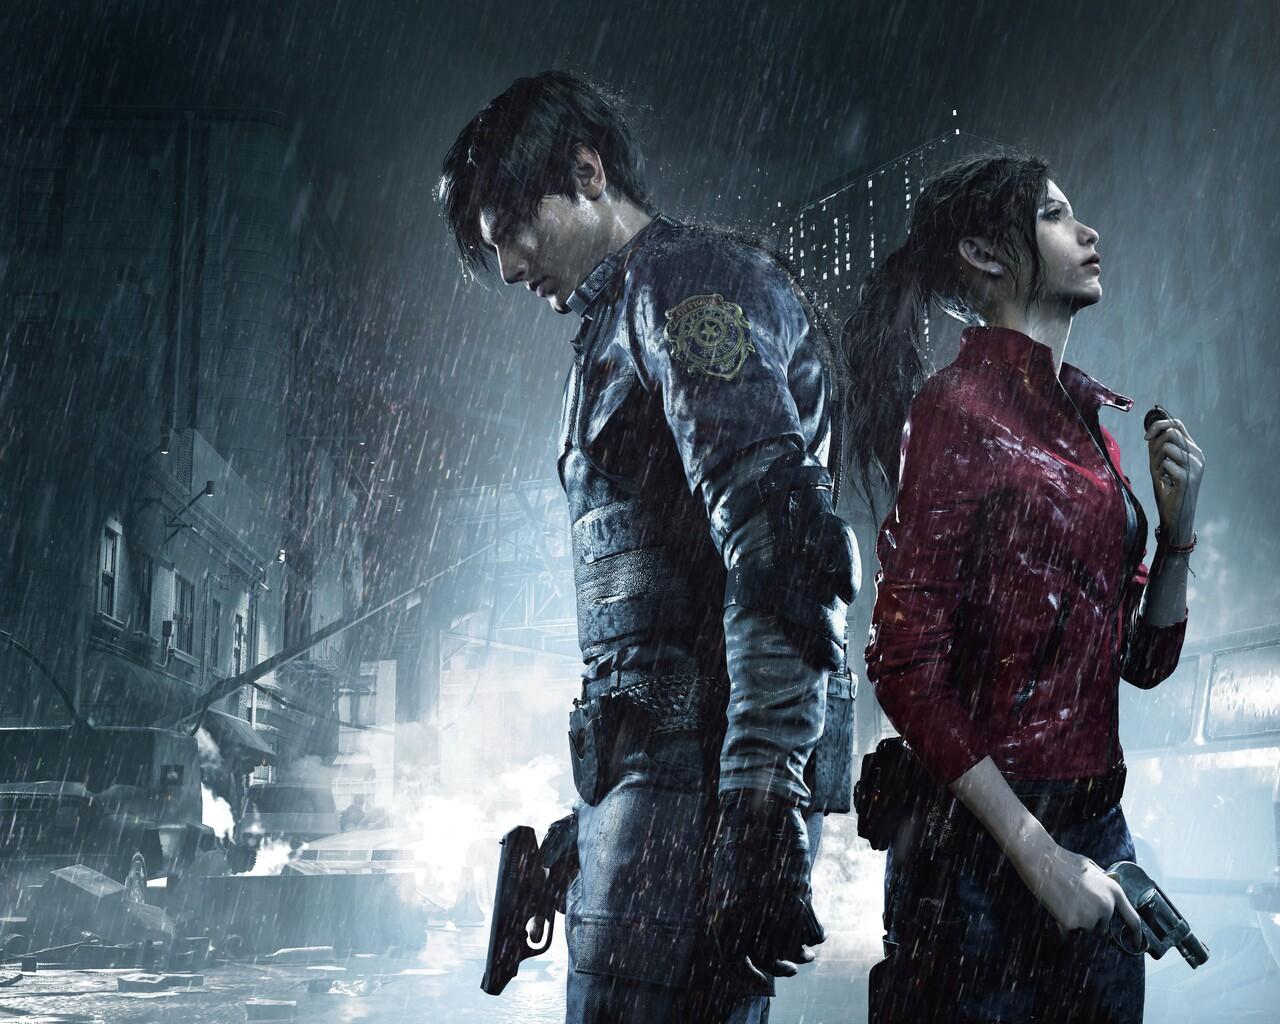 1280x1024 Resident Evil 2 2019 4k 1280x1024 Resolution HD ...